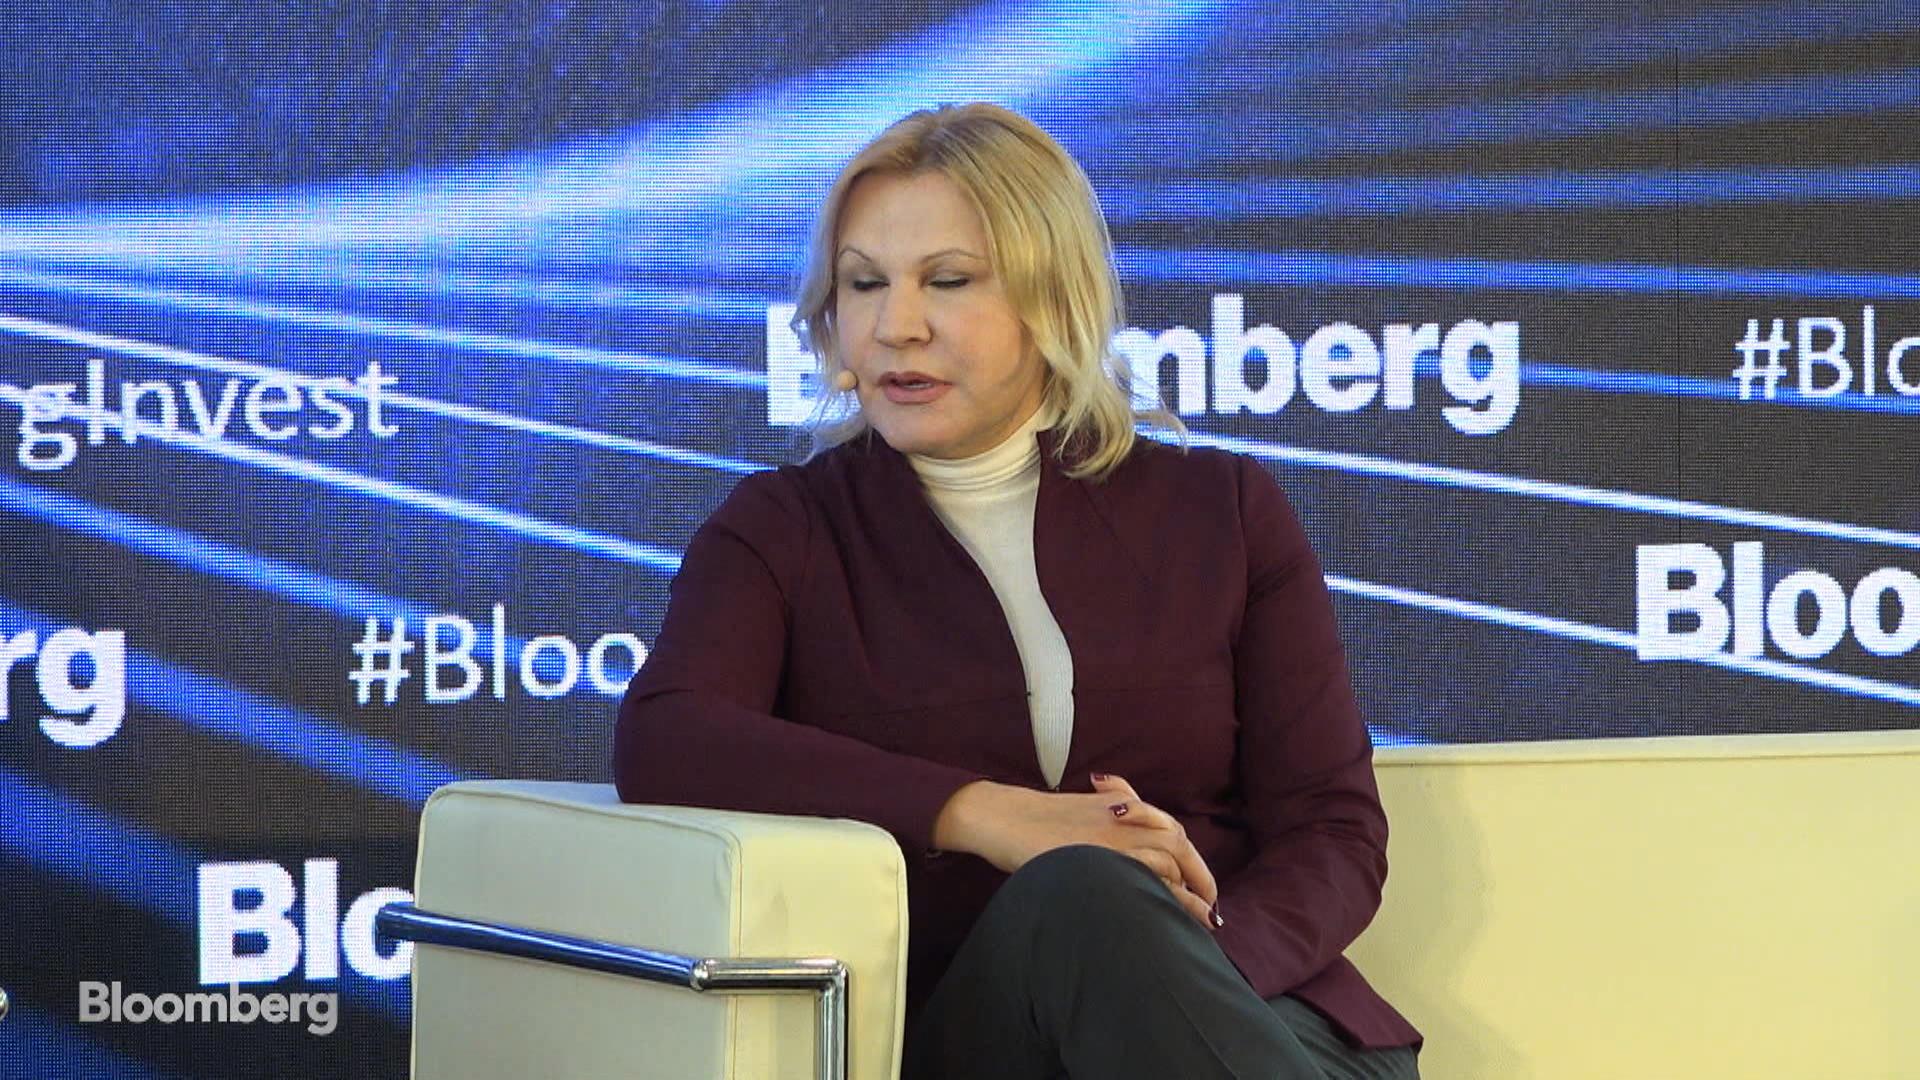 https://www bloomberg com/news/videos/2019-03-29/-bloomberg